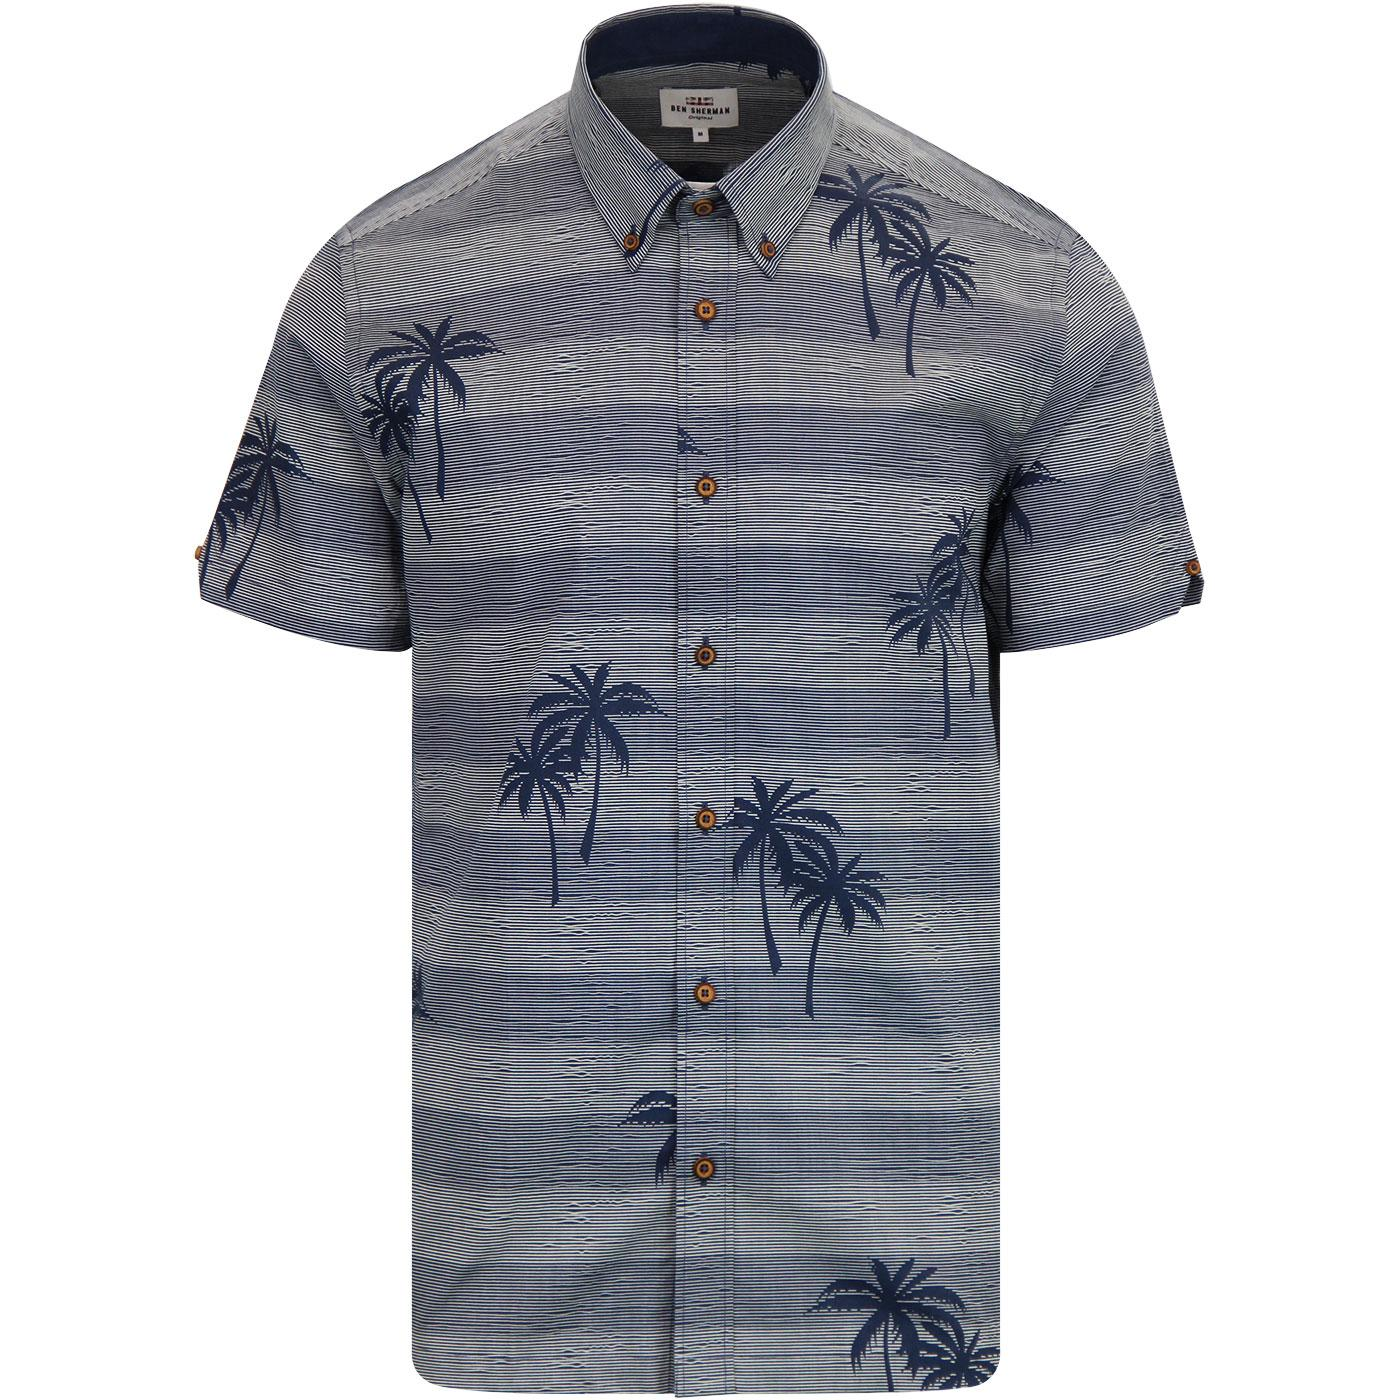 BEN SHERMAN Summer Retro Stripe Tropical Shirt